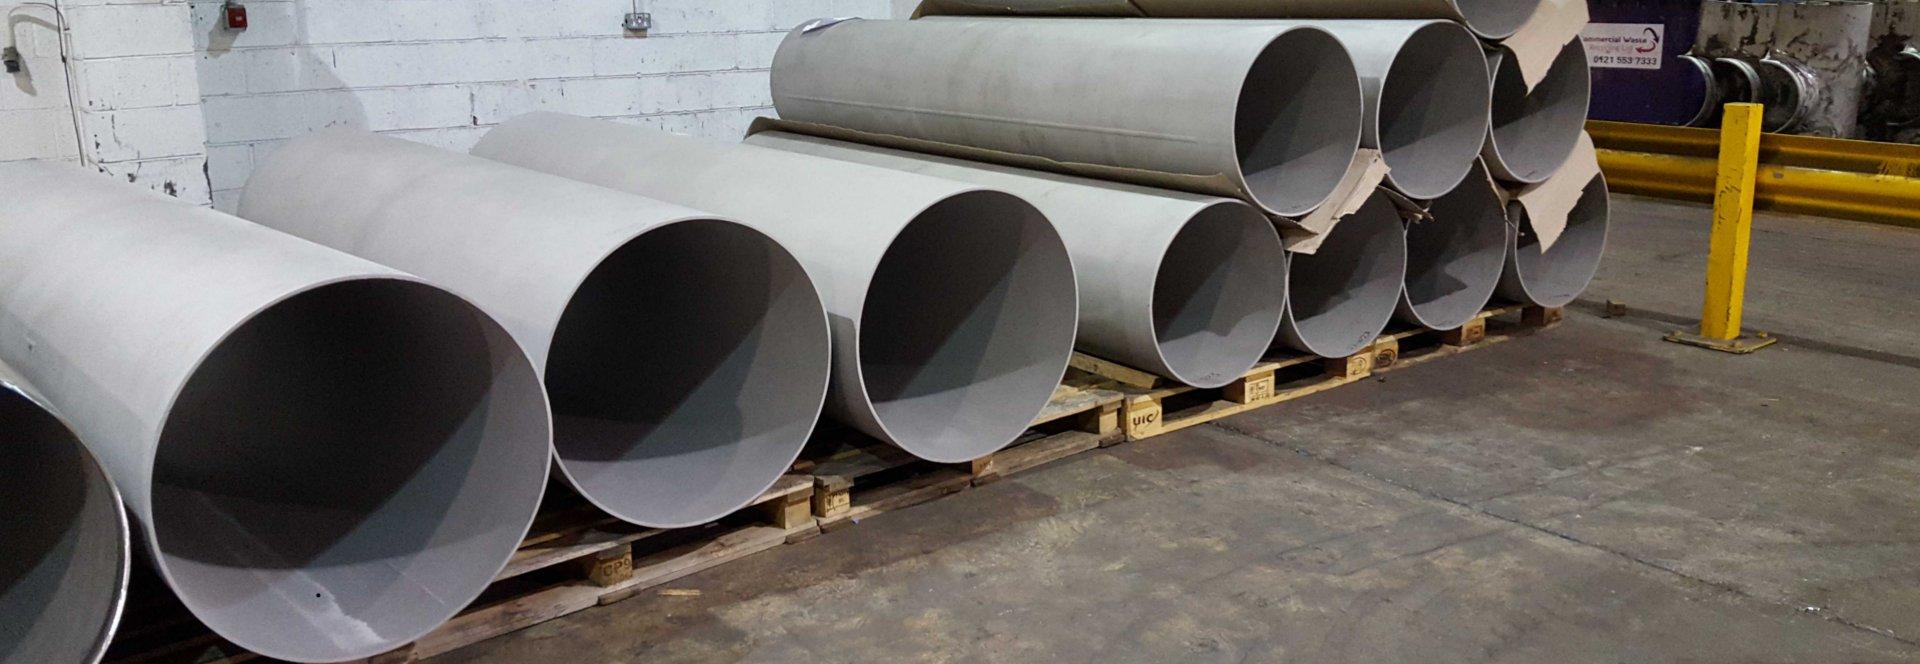 Large diameter Fittings & Steel Pipe Manufacturer - Valen